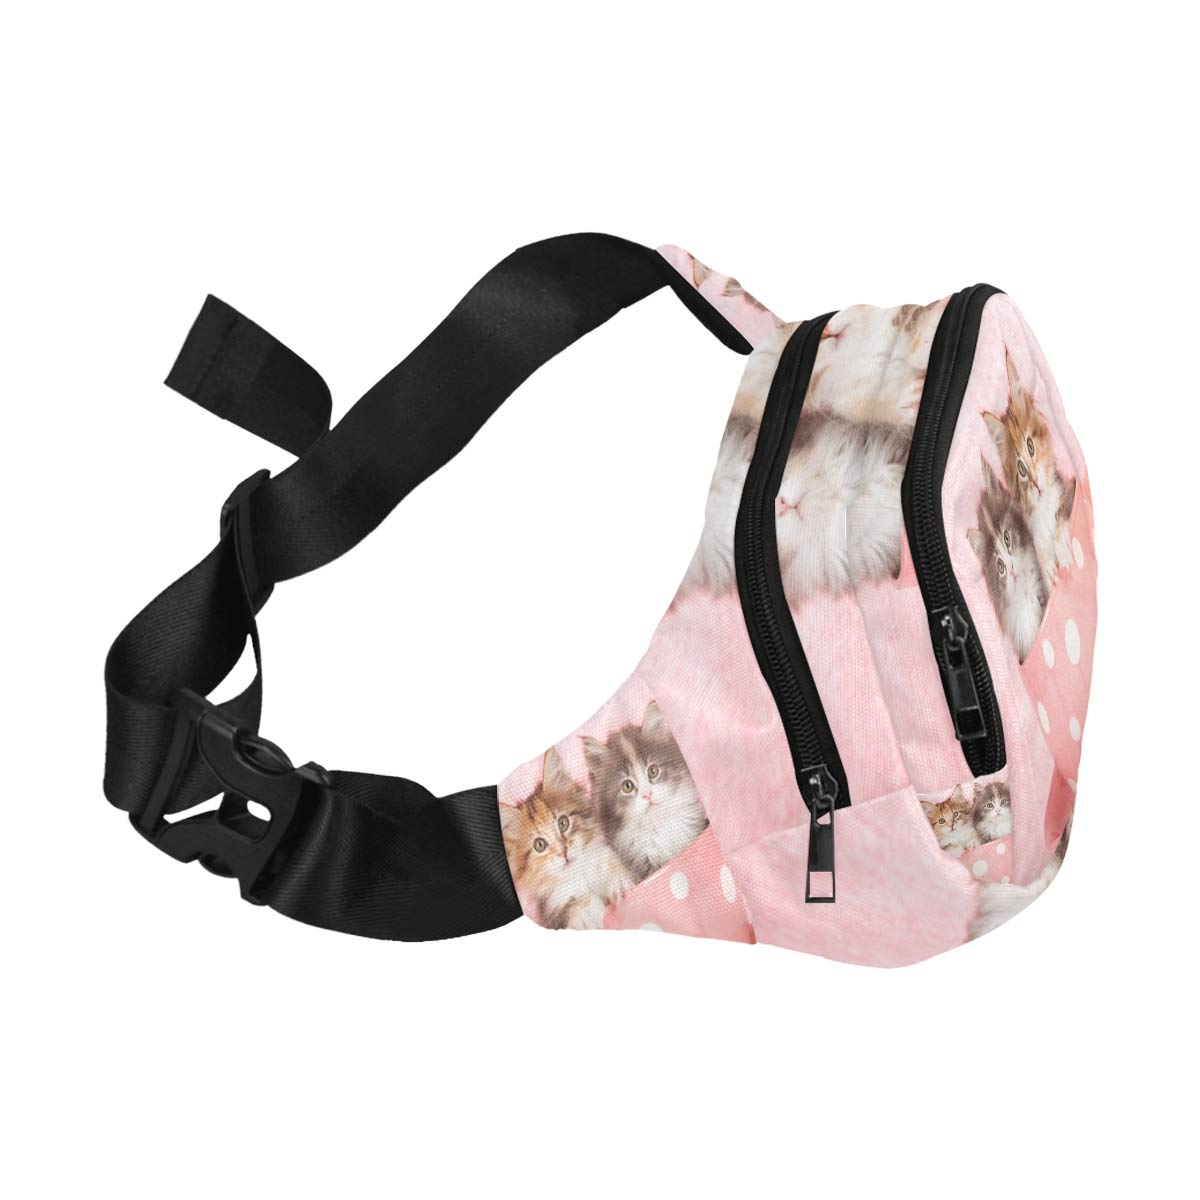 Cute Kitten Sitting In Large Cup Fenny Packs Waist Bags Adjustable Belt Waterproof Nylon Travel Running Sport Vacation Party For Men Women Boys Girls Kids